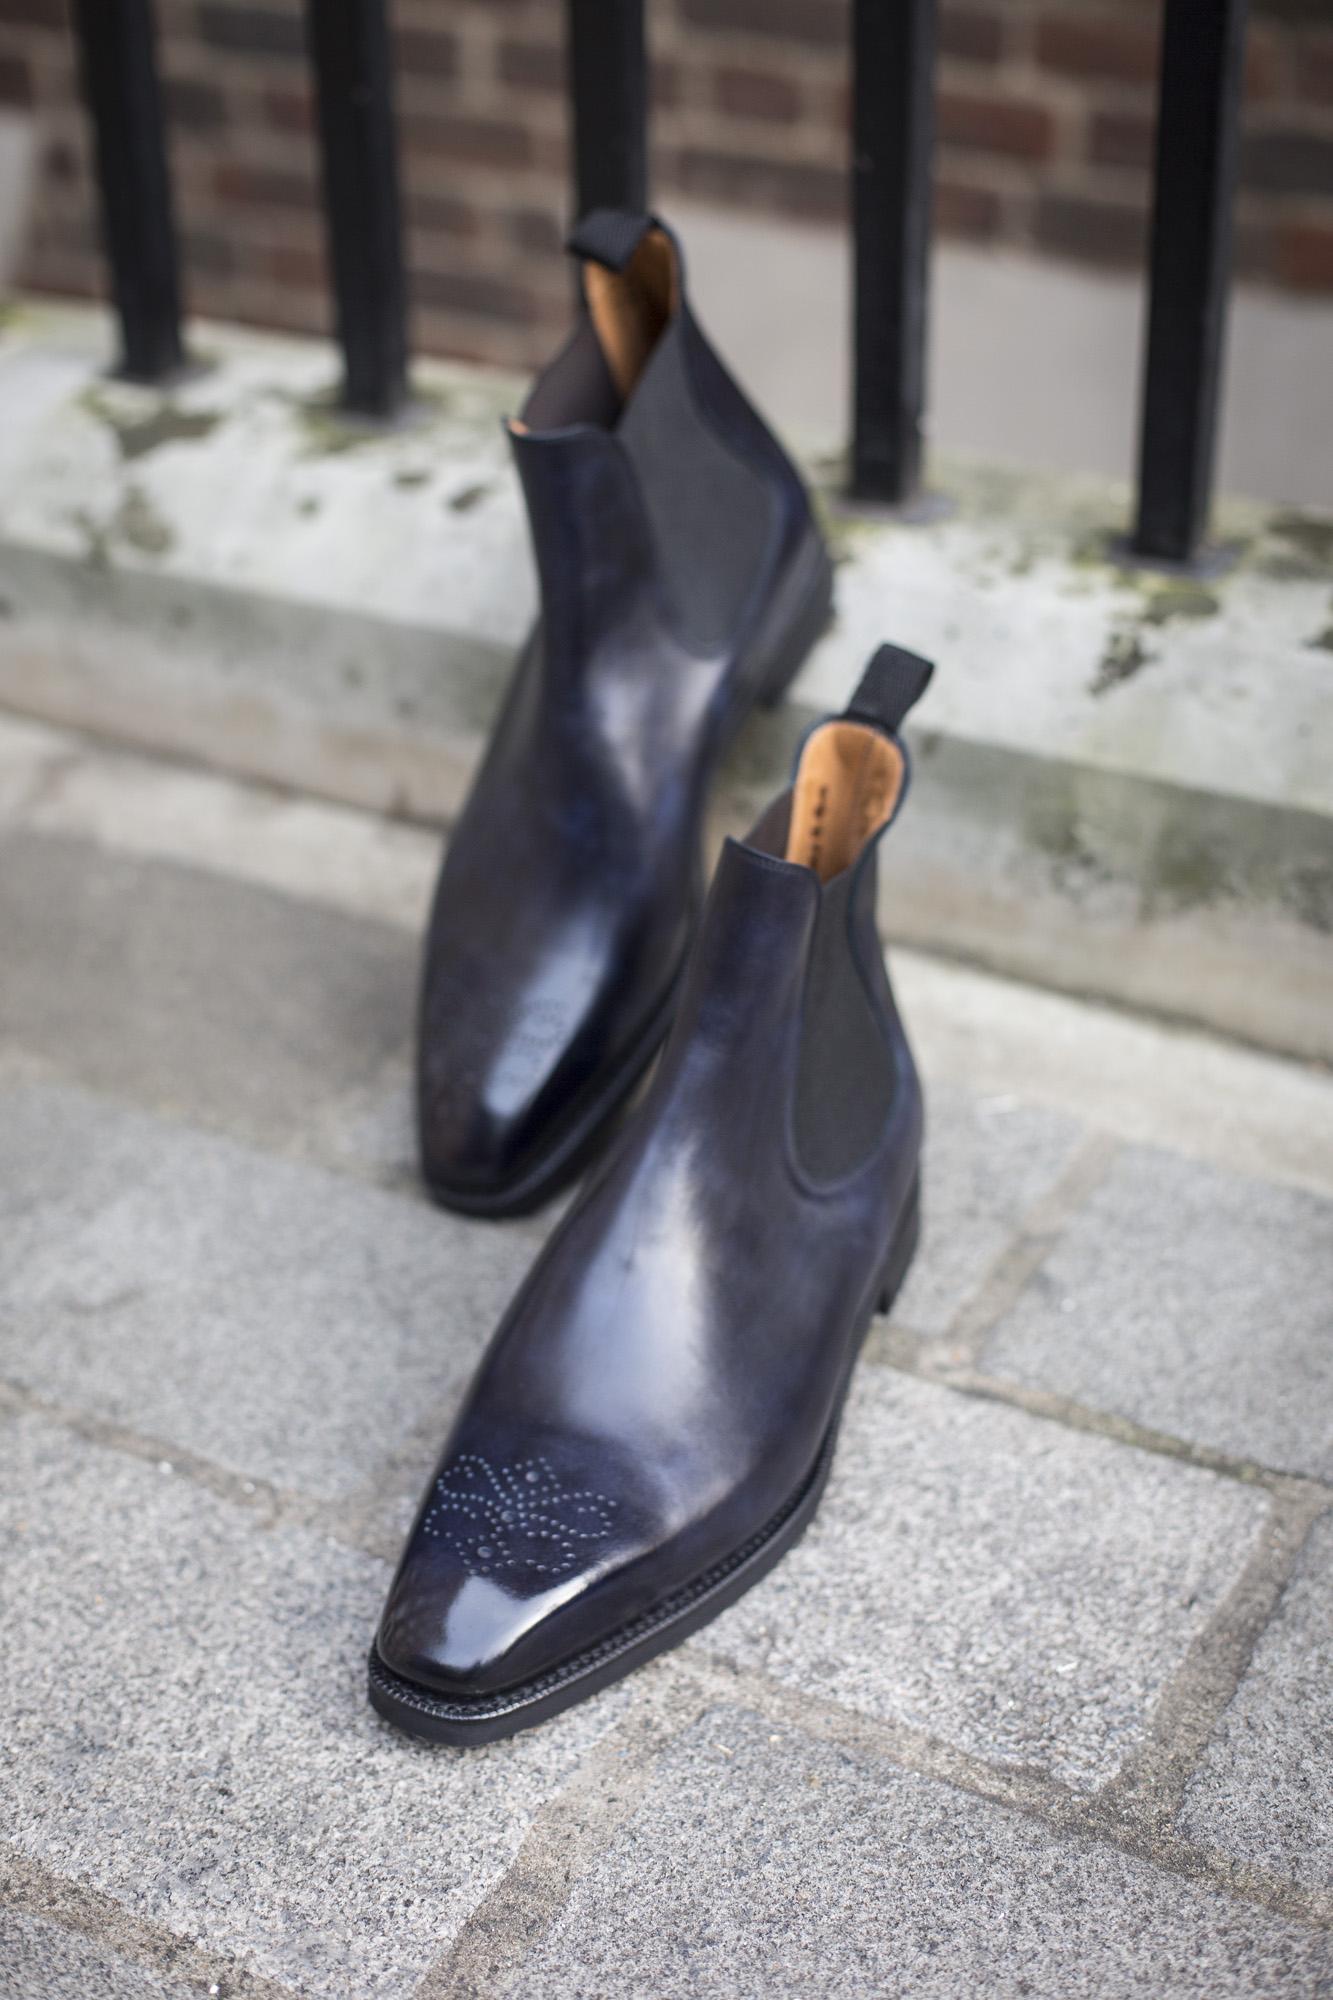 j-fitzpatrick-footwear-collection-9-november-2017-hero-singles-0186.jpg